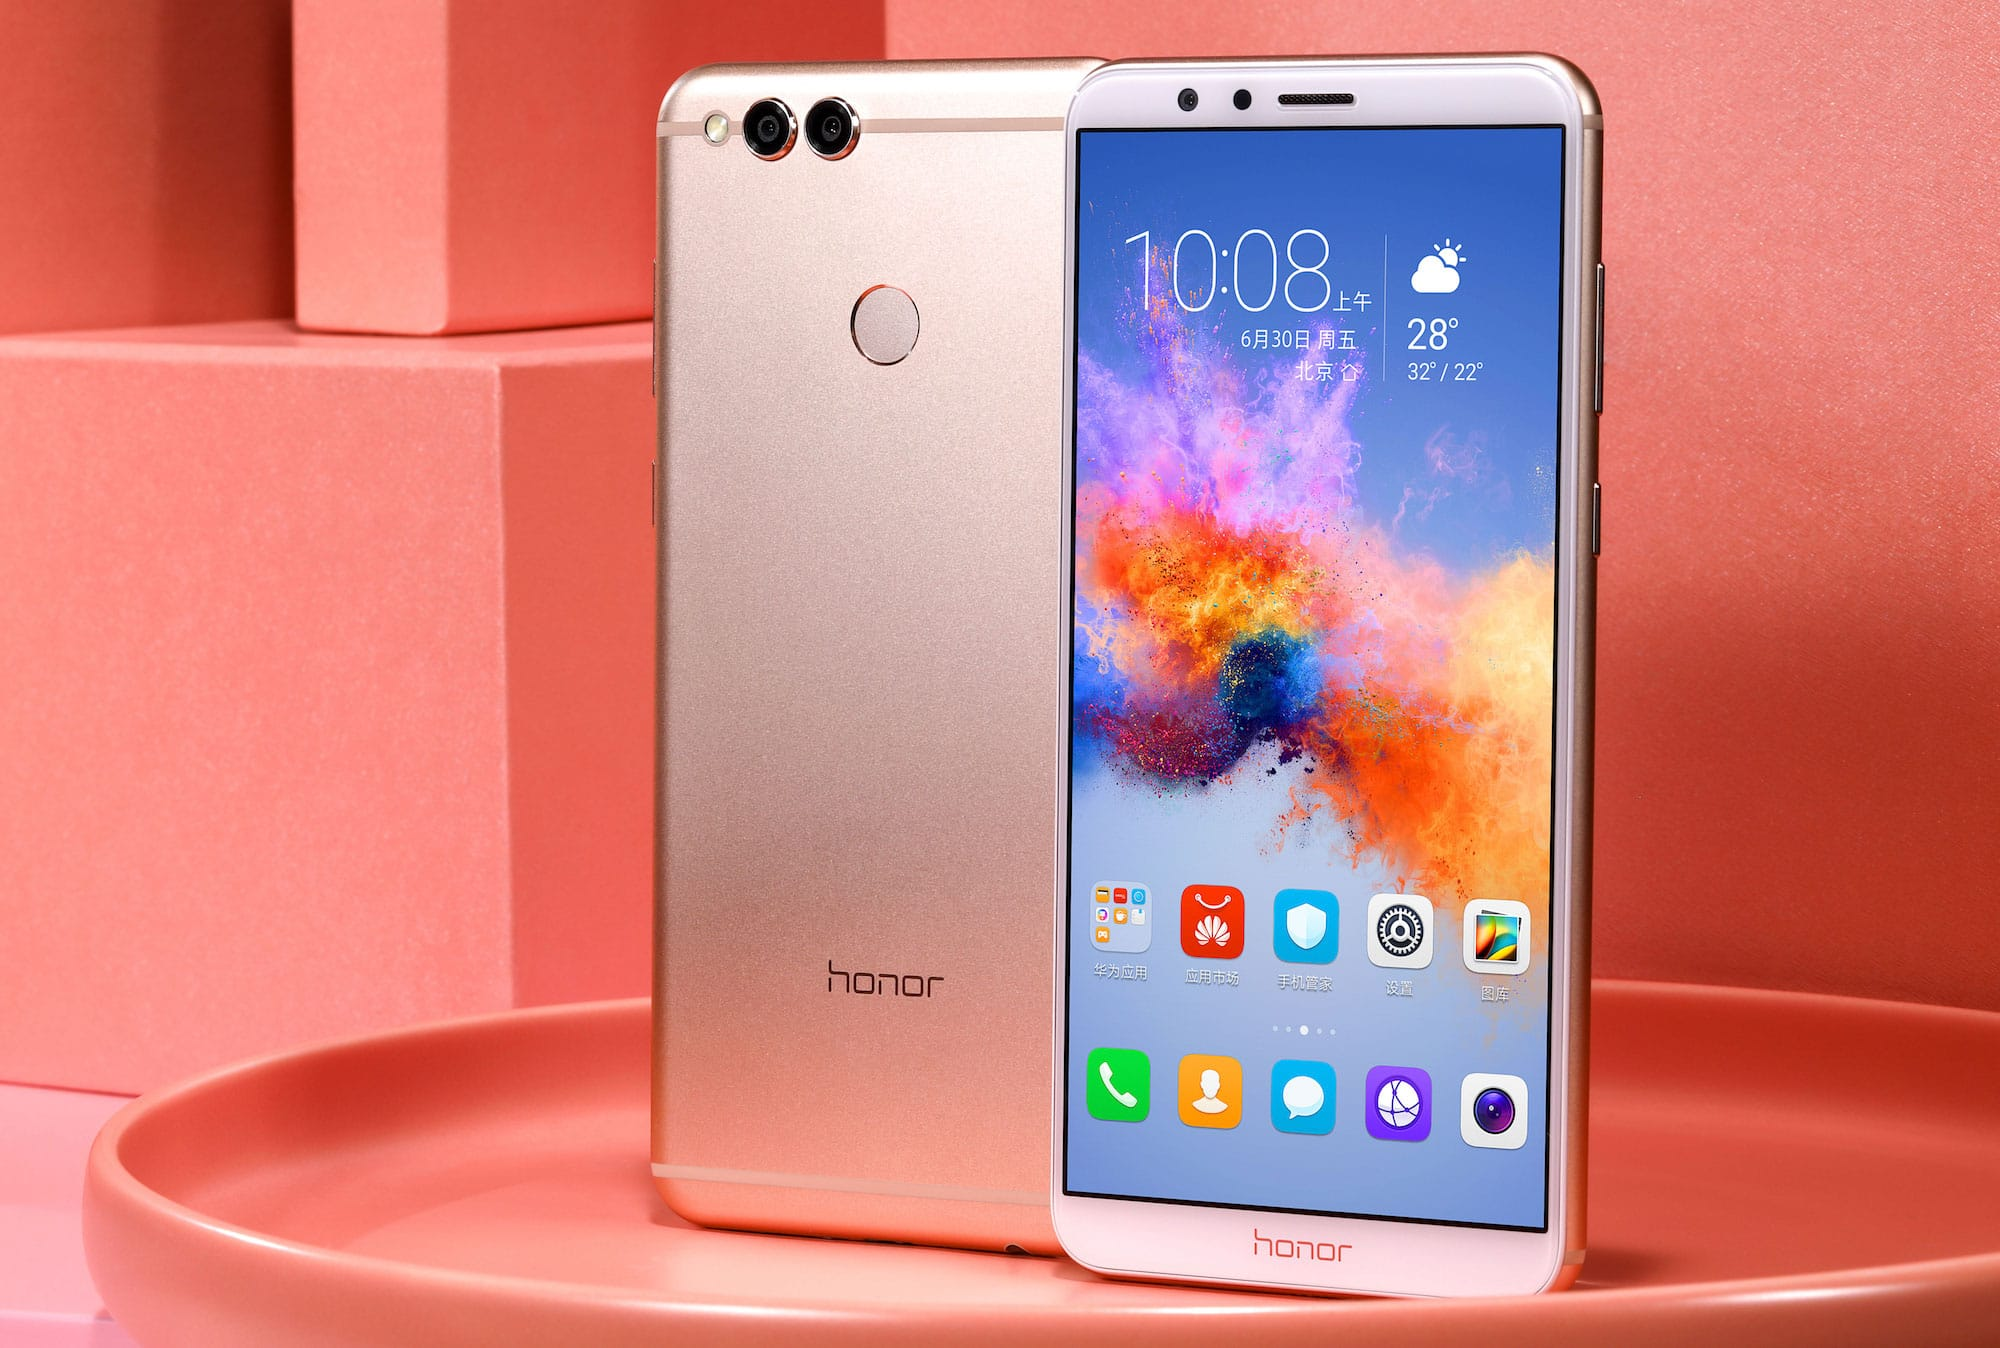 Компания Huawei представила новый безрамочный флагман Honor V10